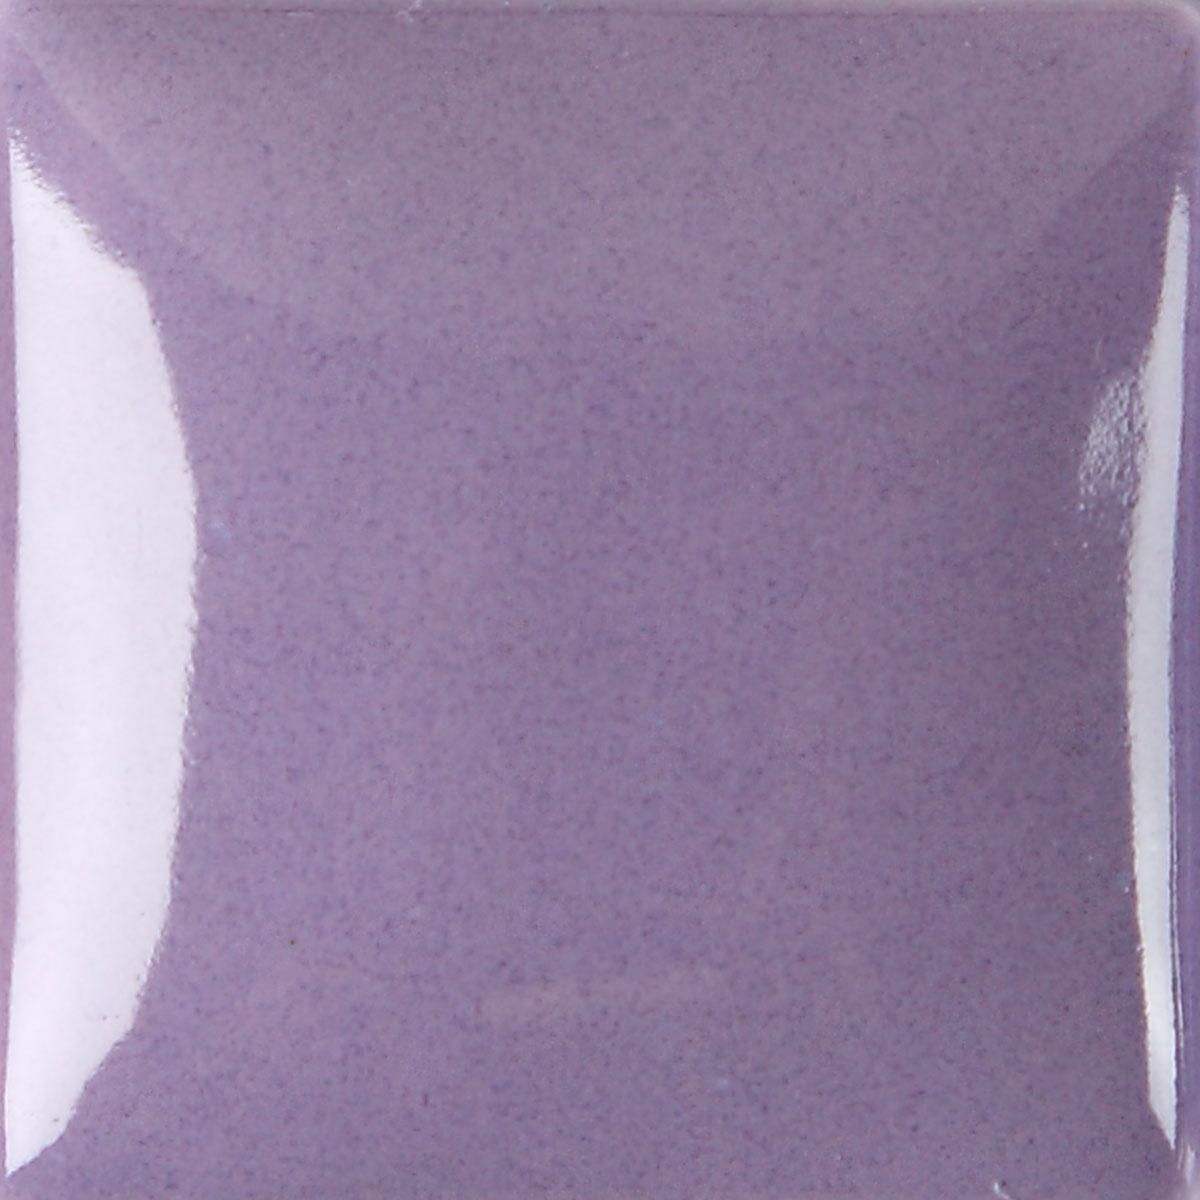 Ceramics & Pottery Craft Supplies ghdonat.com Orchid 4 Ounce Jar ...